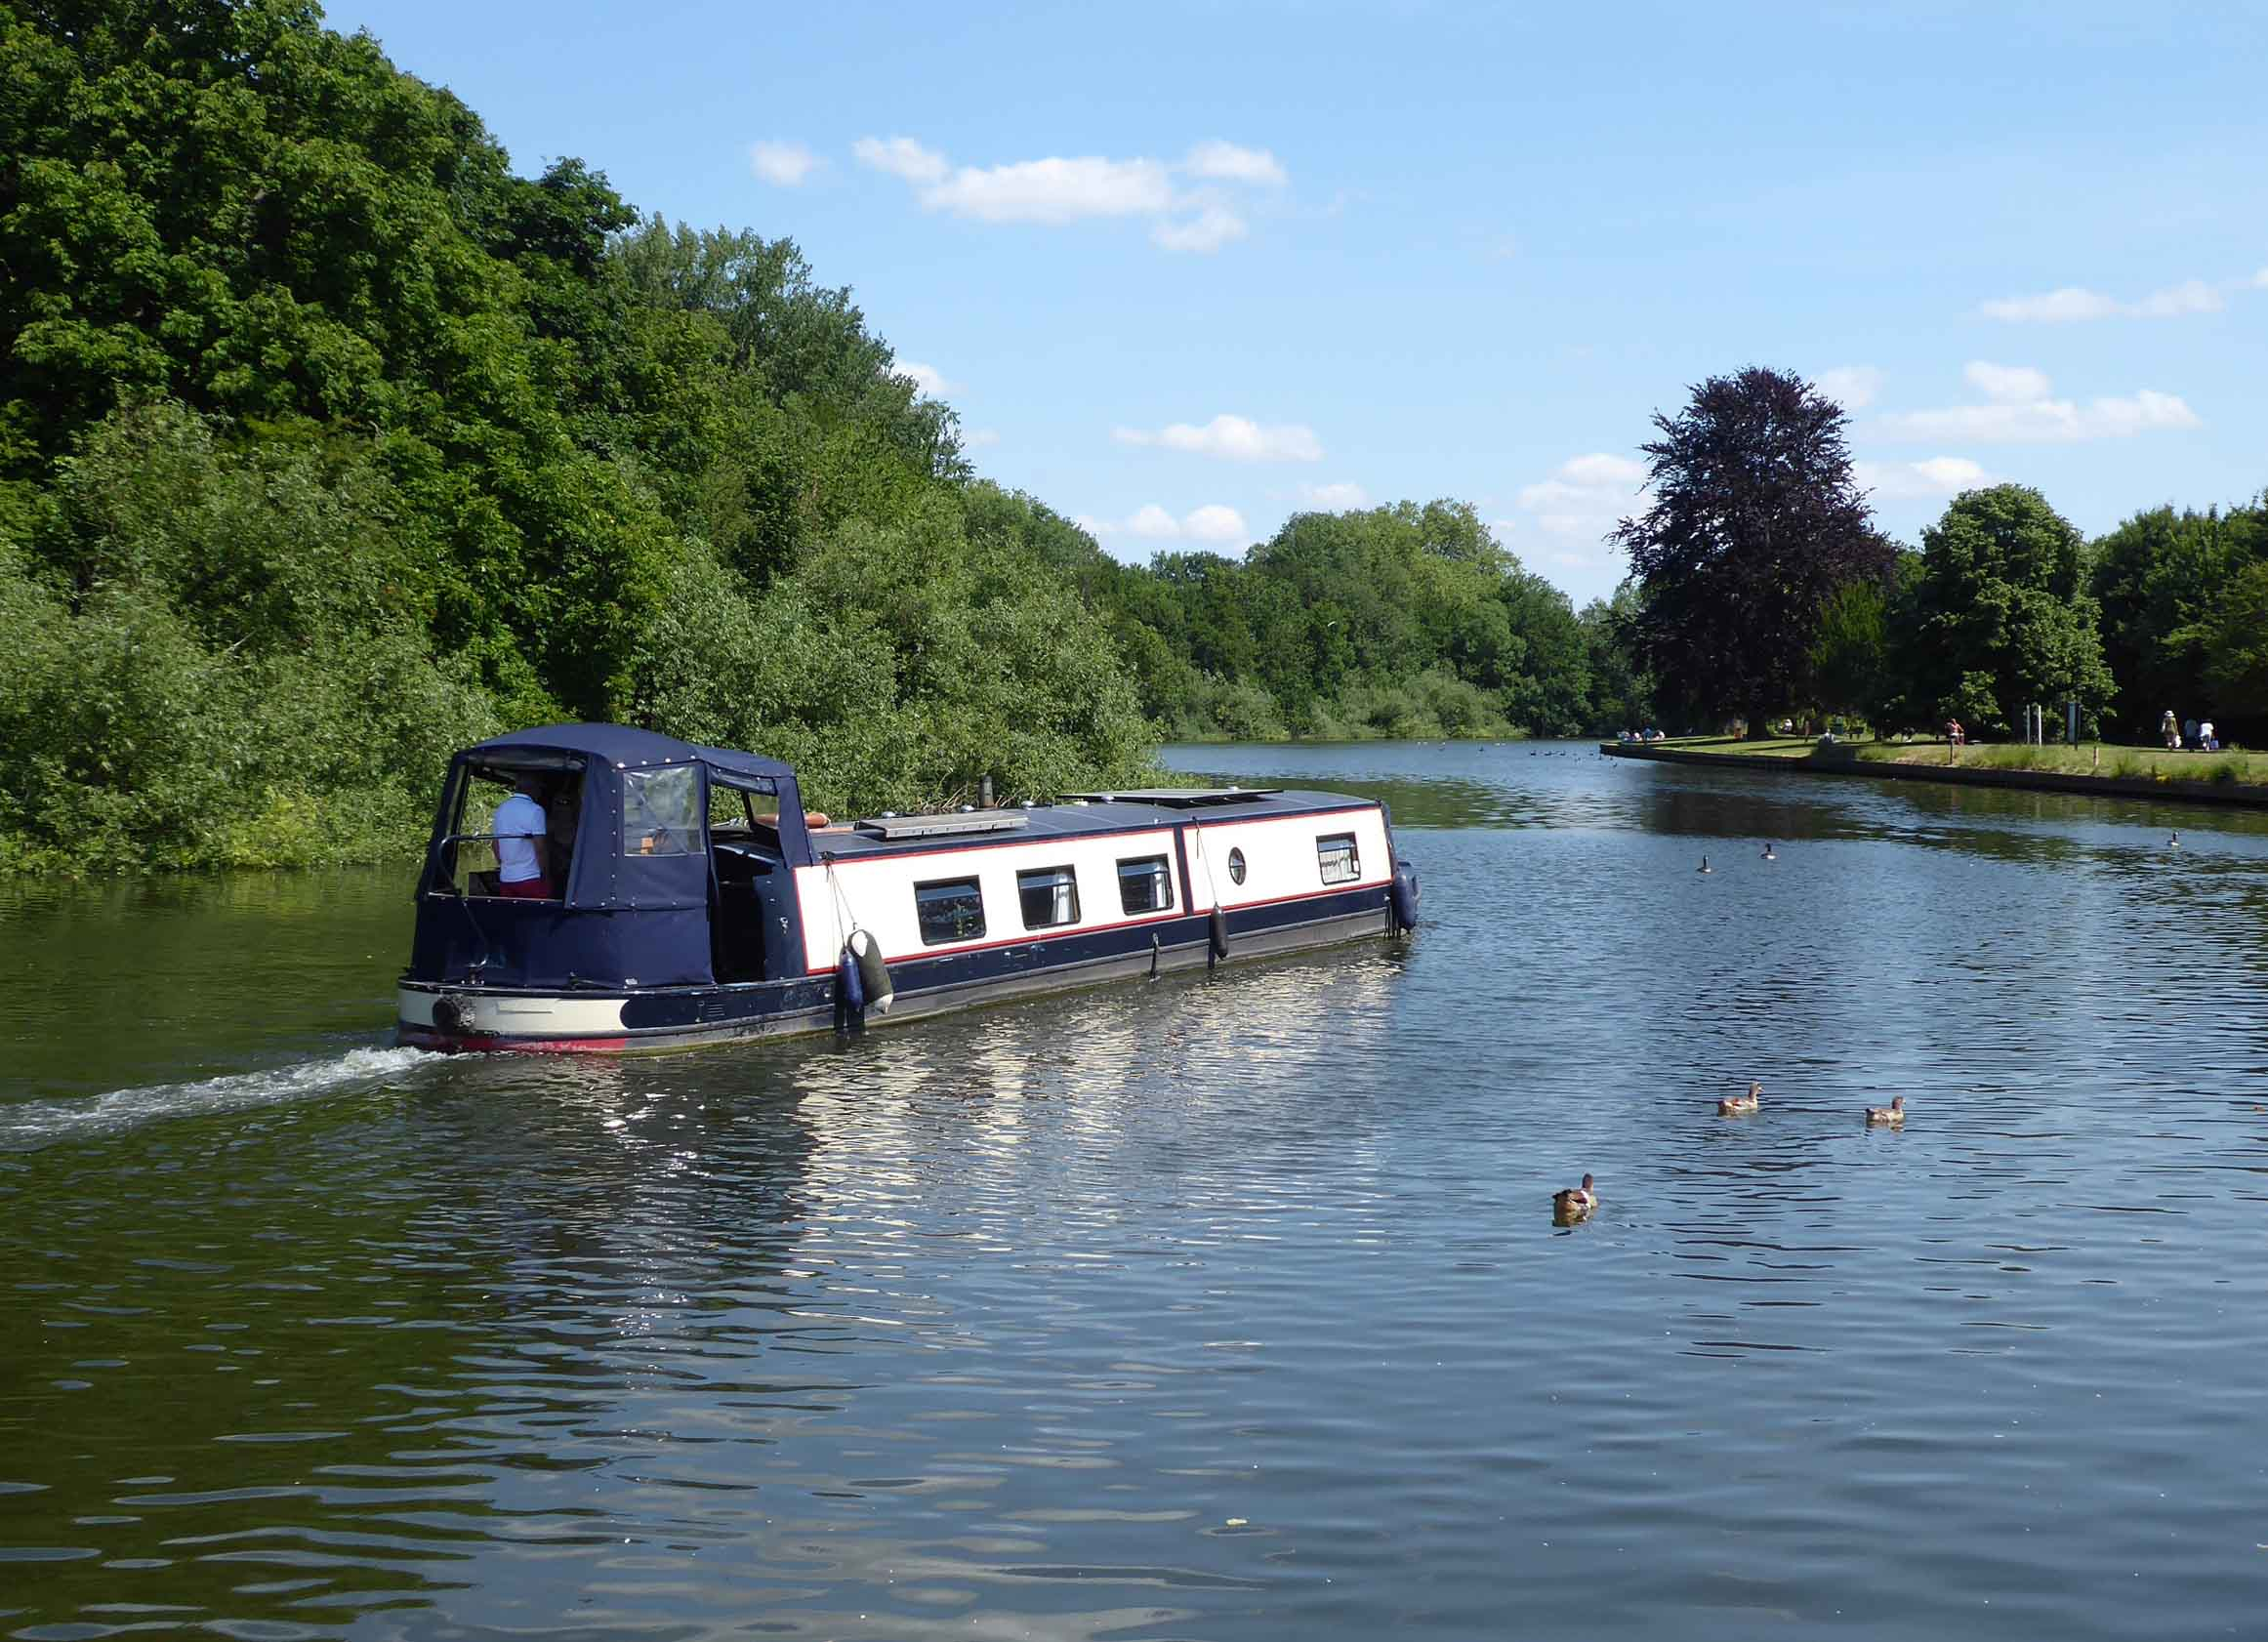 Narrowboat on a river